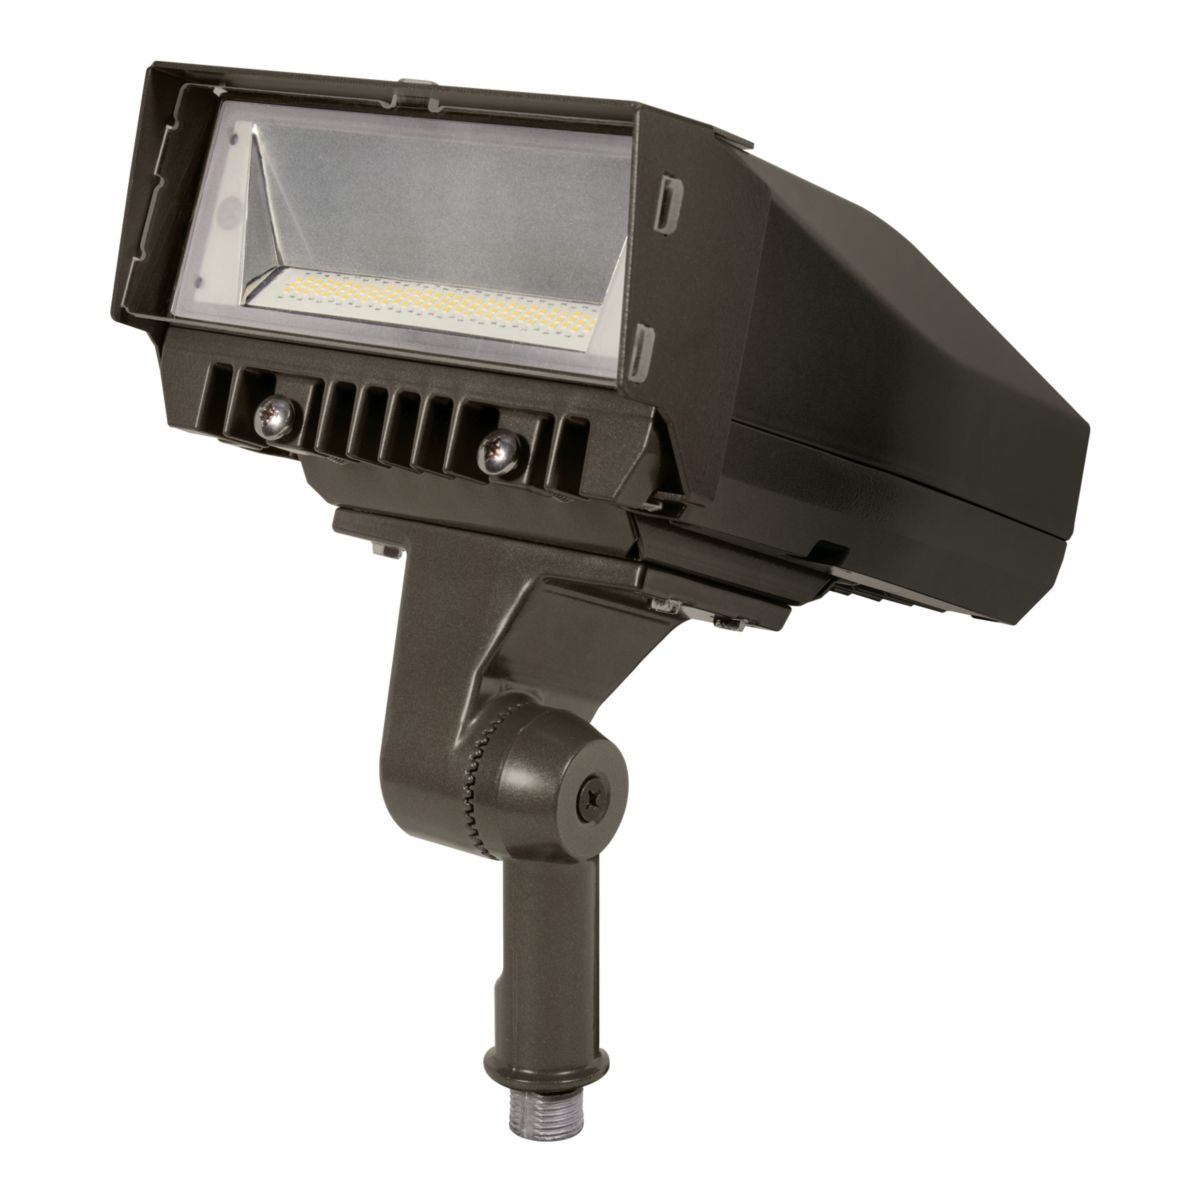 AXC Axcent LED Floodlight